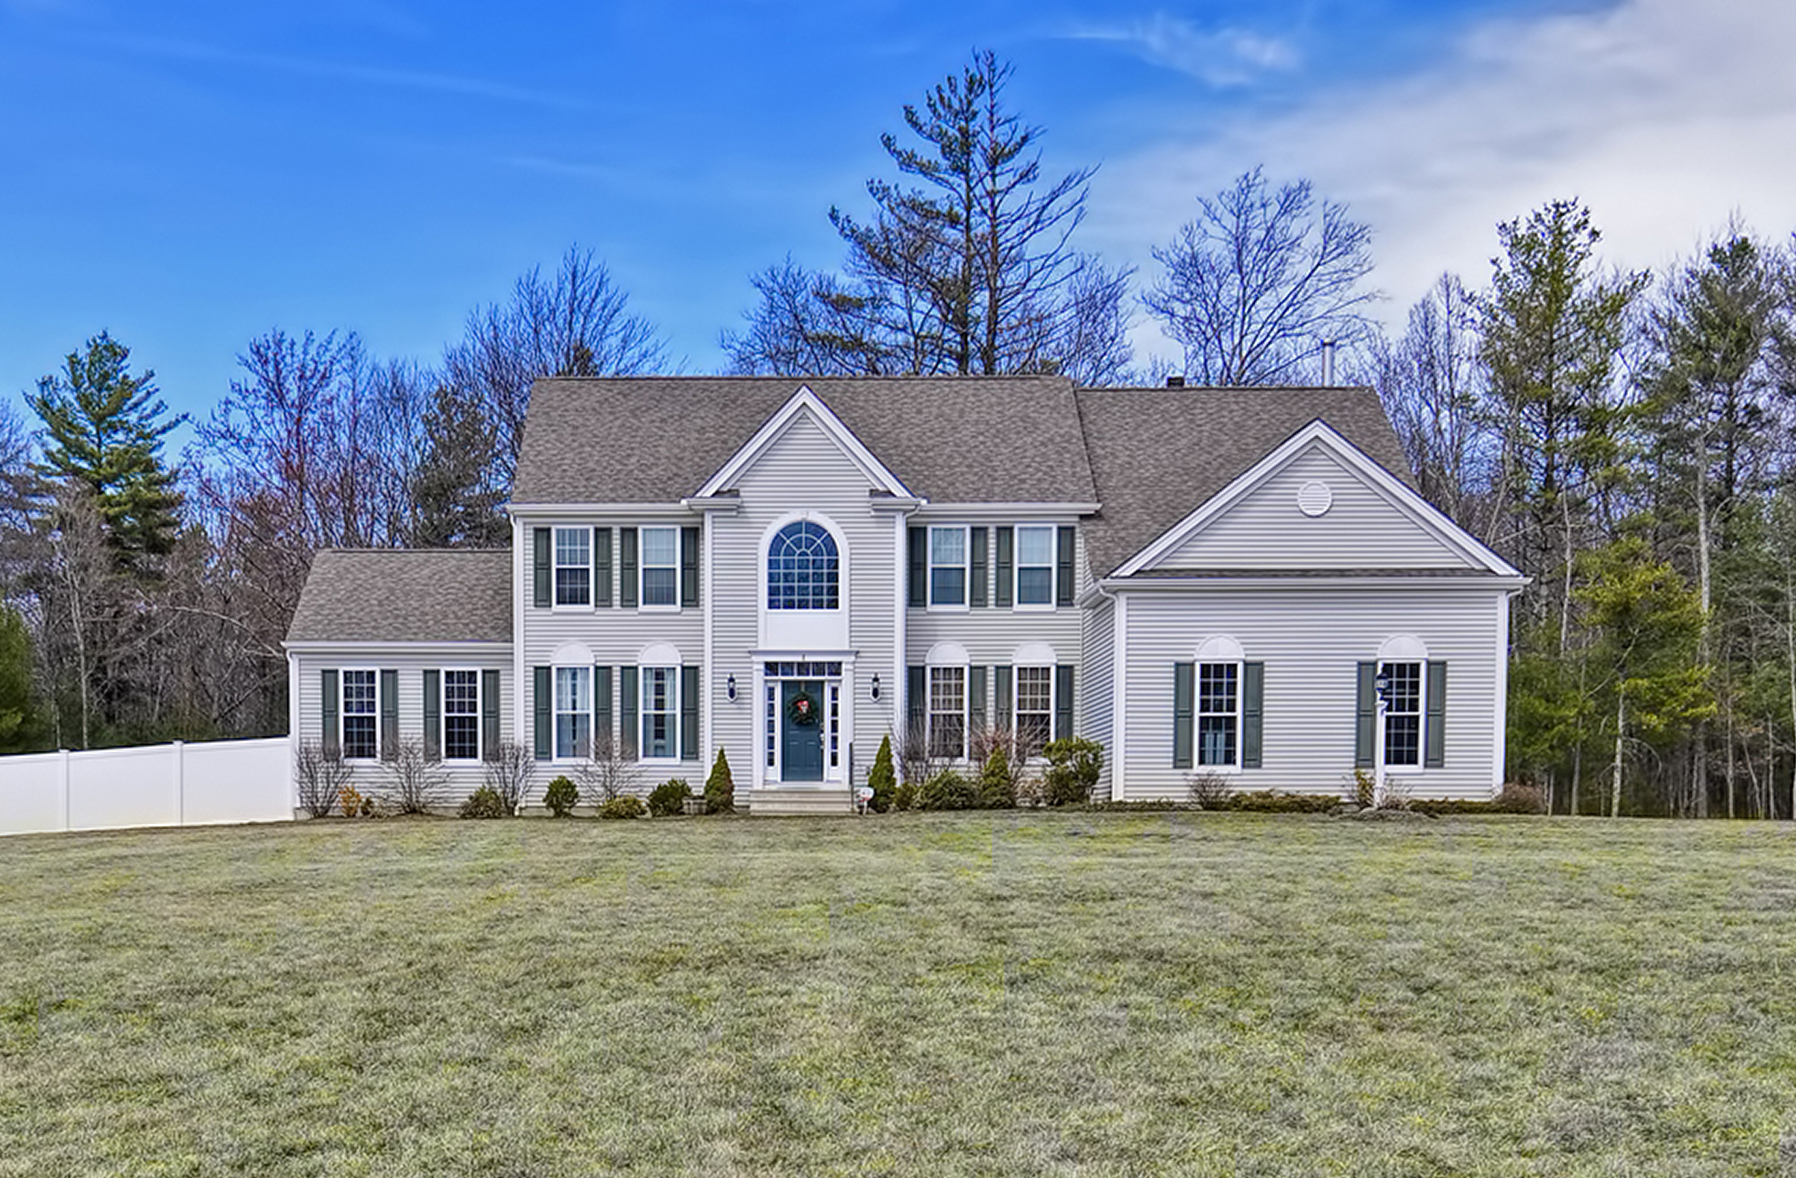 Casa Unifamiliar por un Venta en Expansive Colonial 8 Francis Drive Upton, Massachusetts, 01568 Estados Unidos